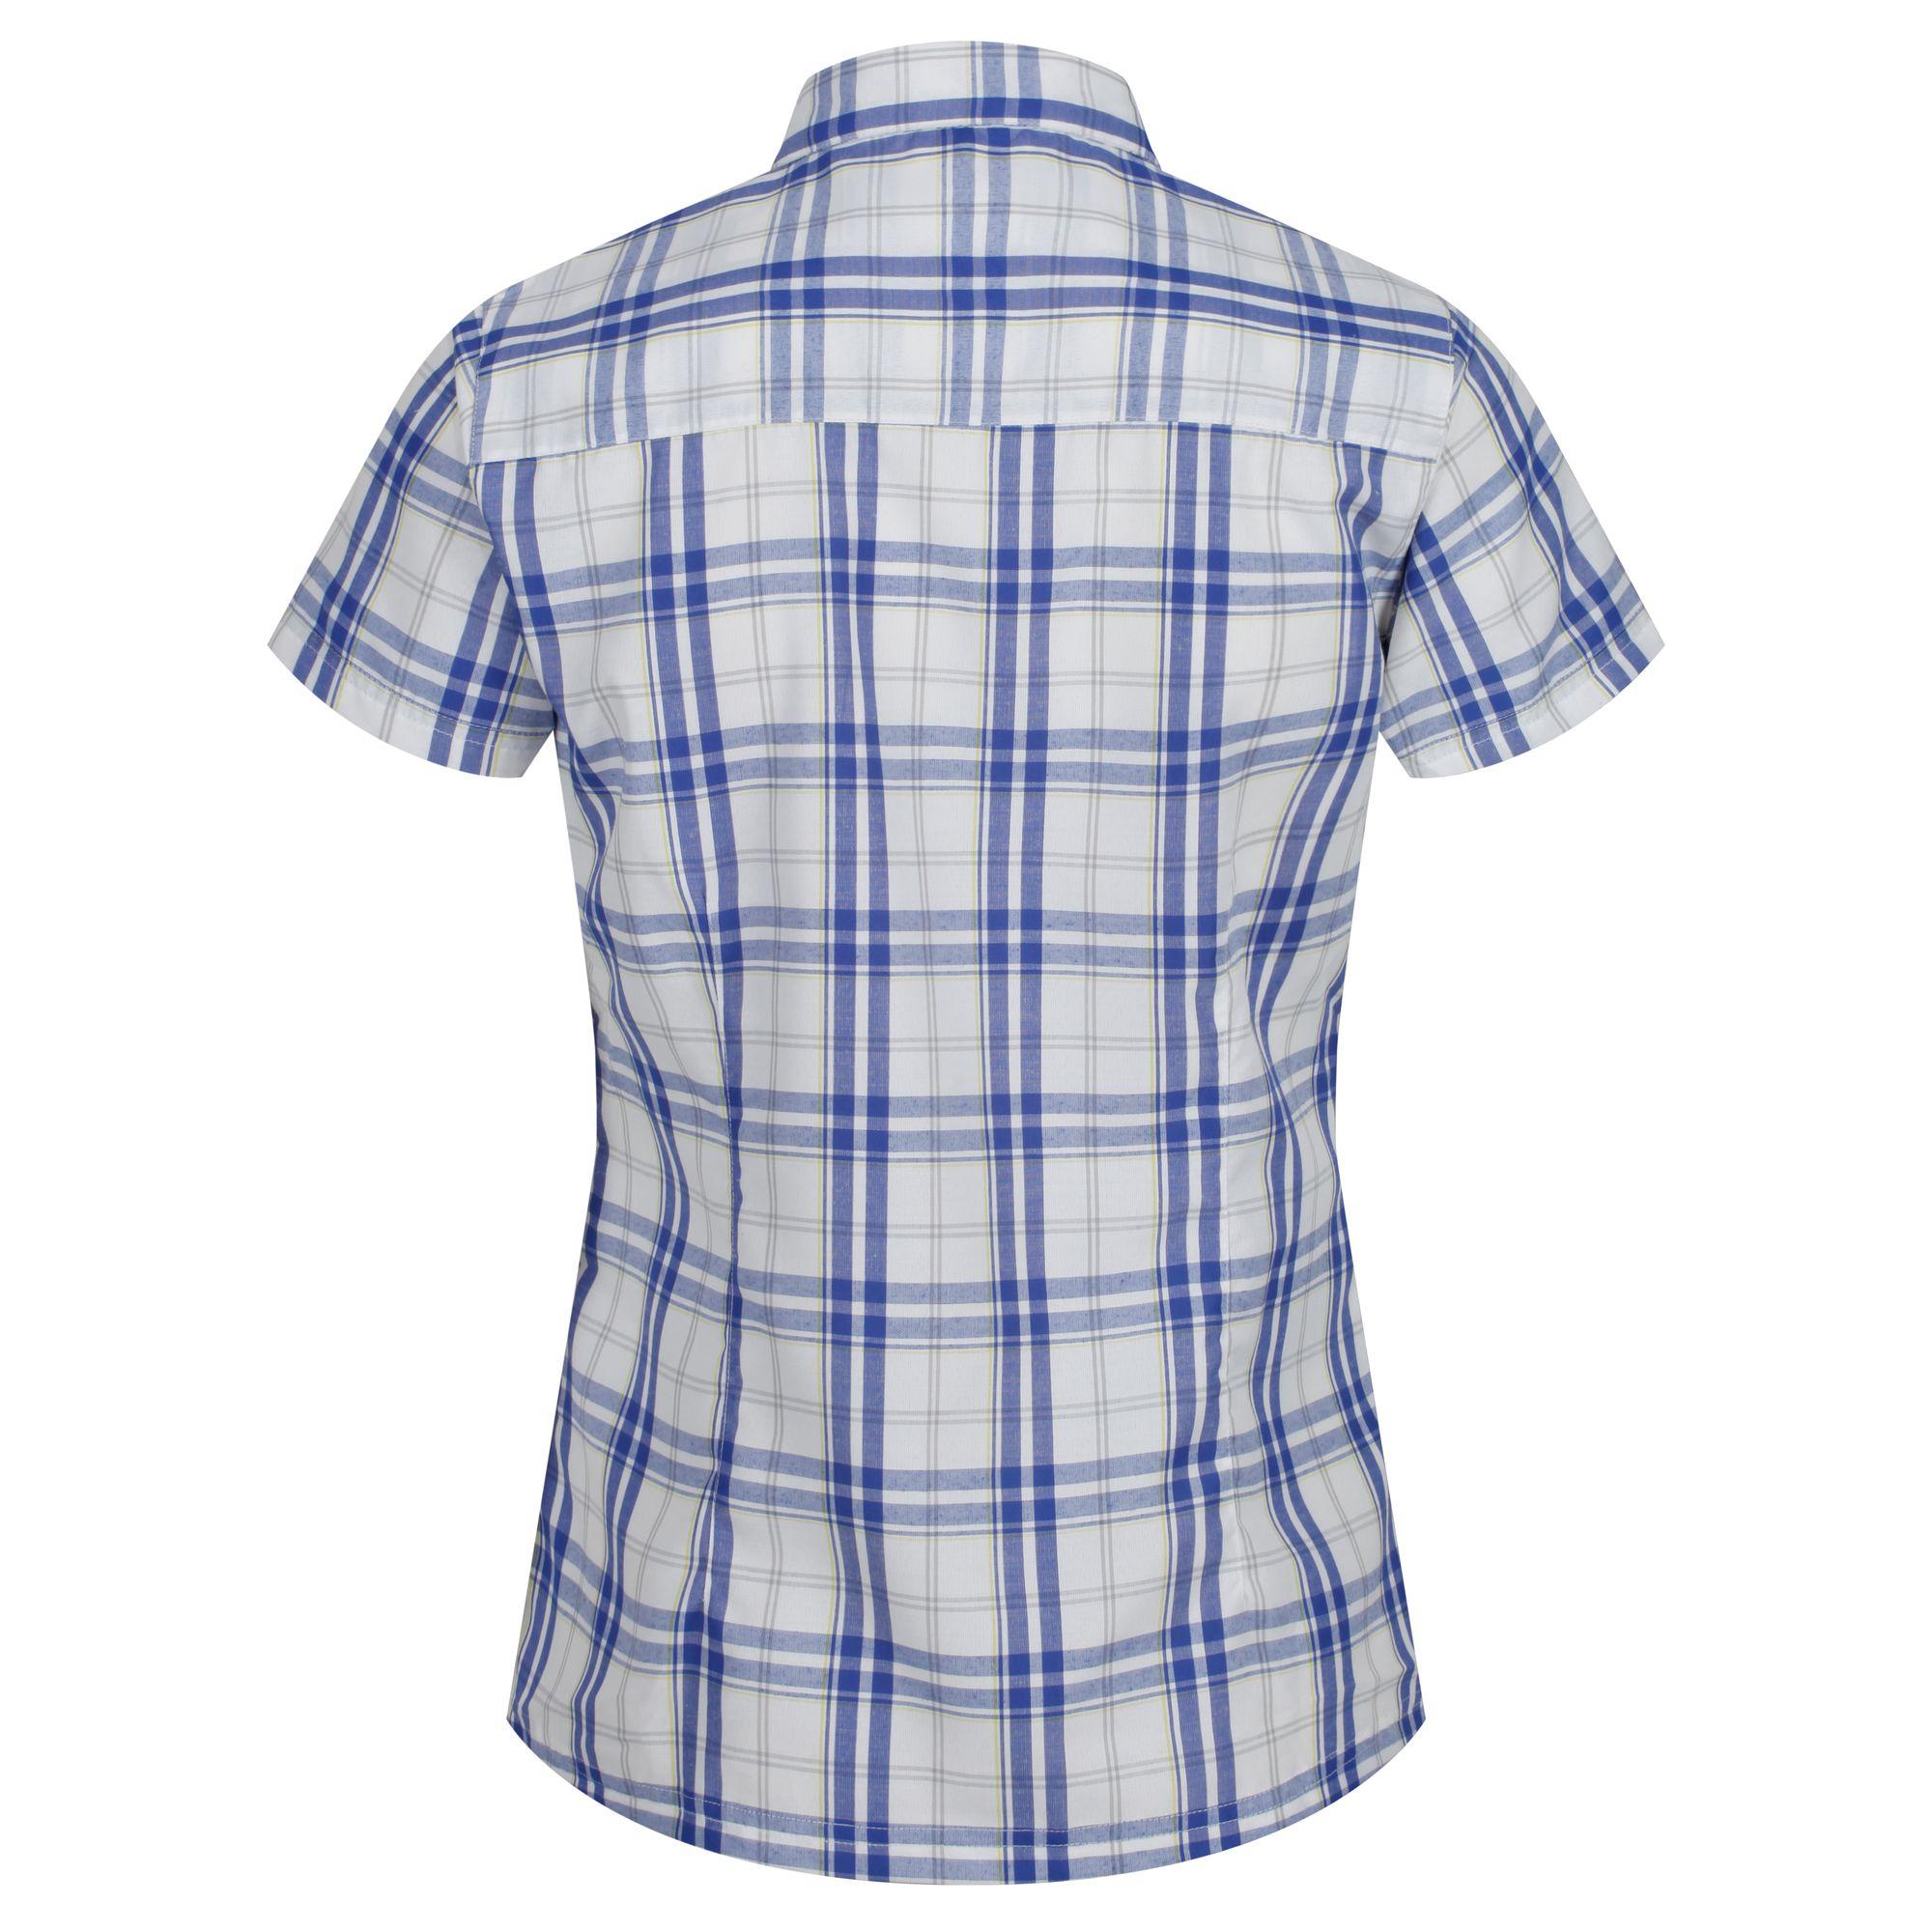 Regatta-Womens-Ladies-Mindano-IV-Short-Sleeve-Checked-Shirt-RG4253 thumbnail 4